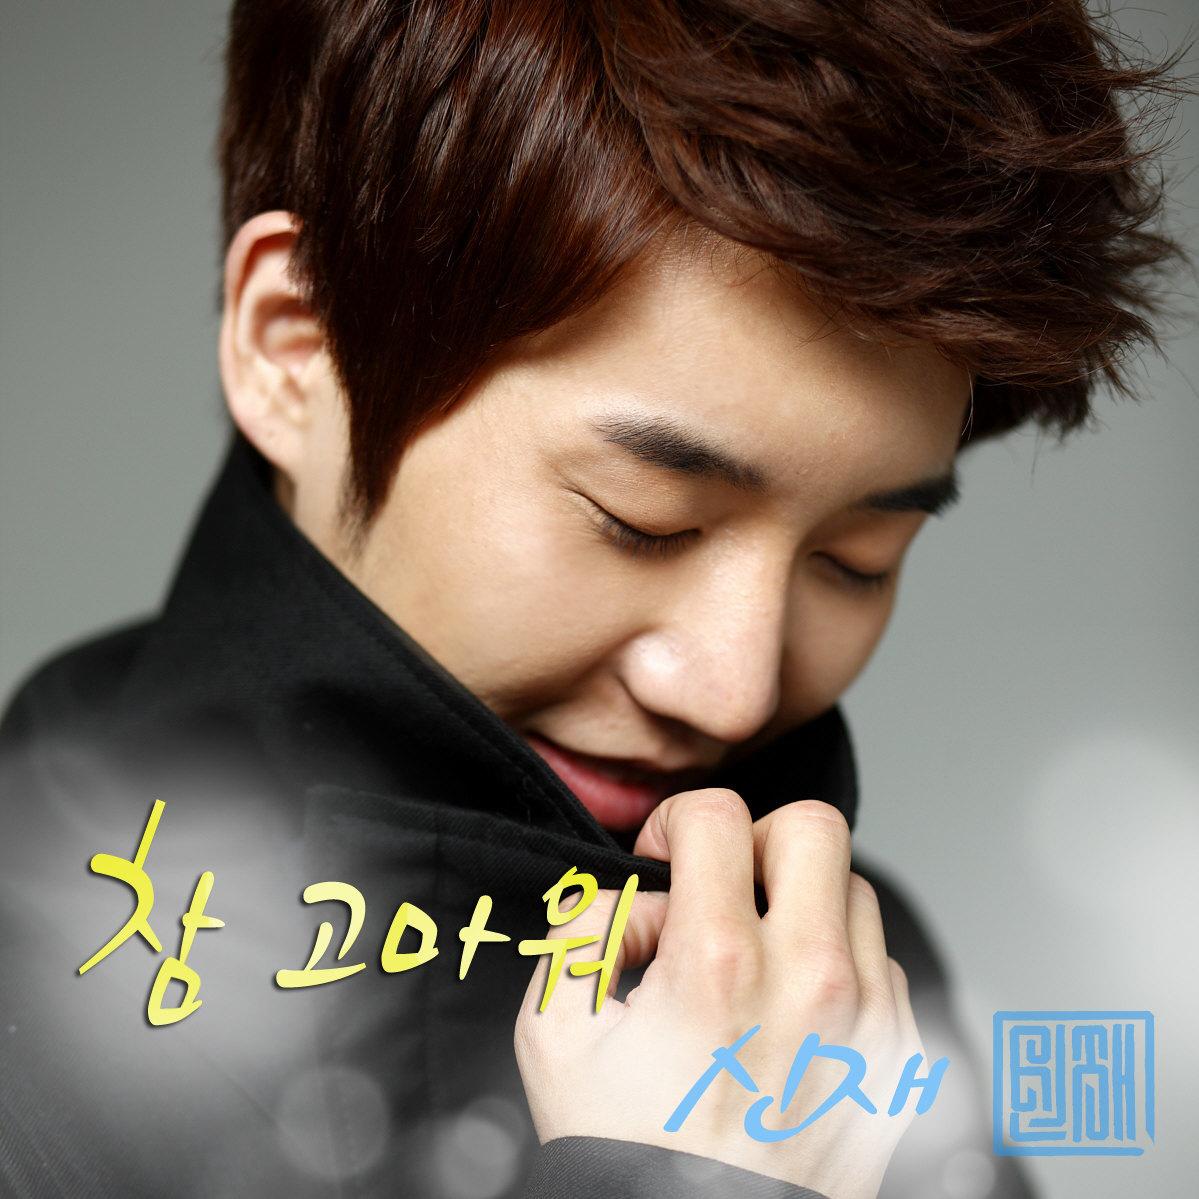 Thank You Next Download Mp3 Wapka: Download [Single] Shin Jae